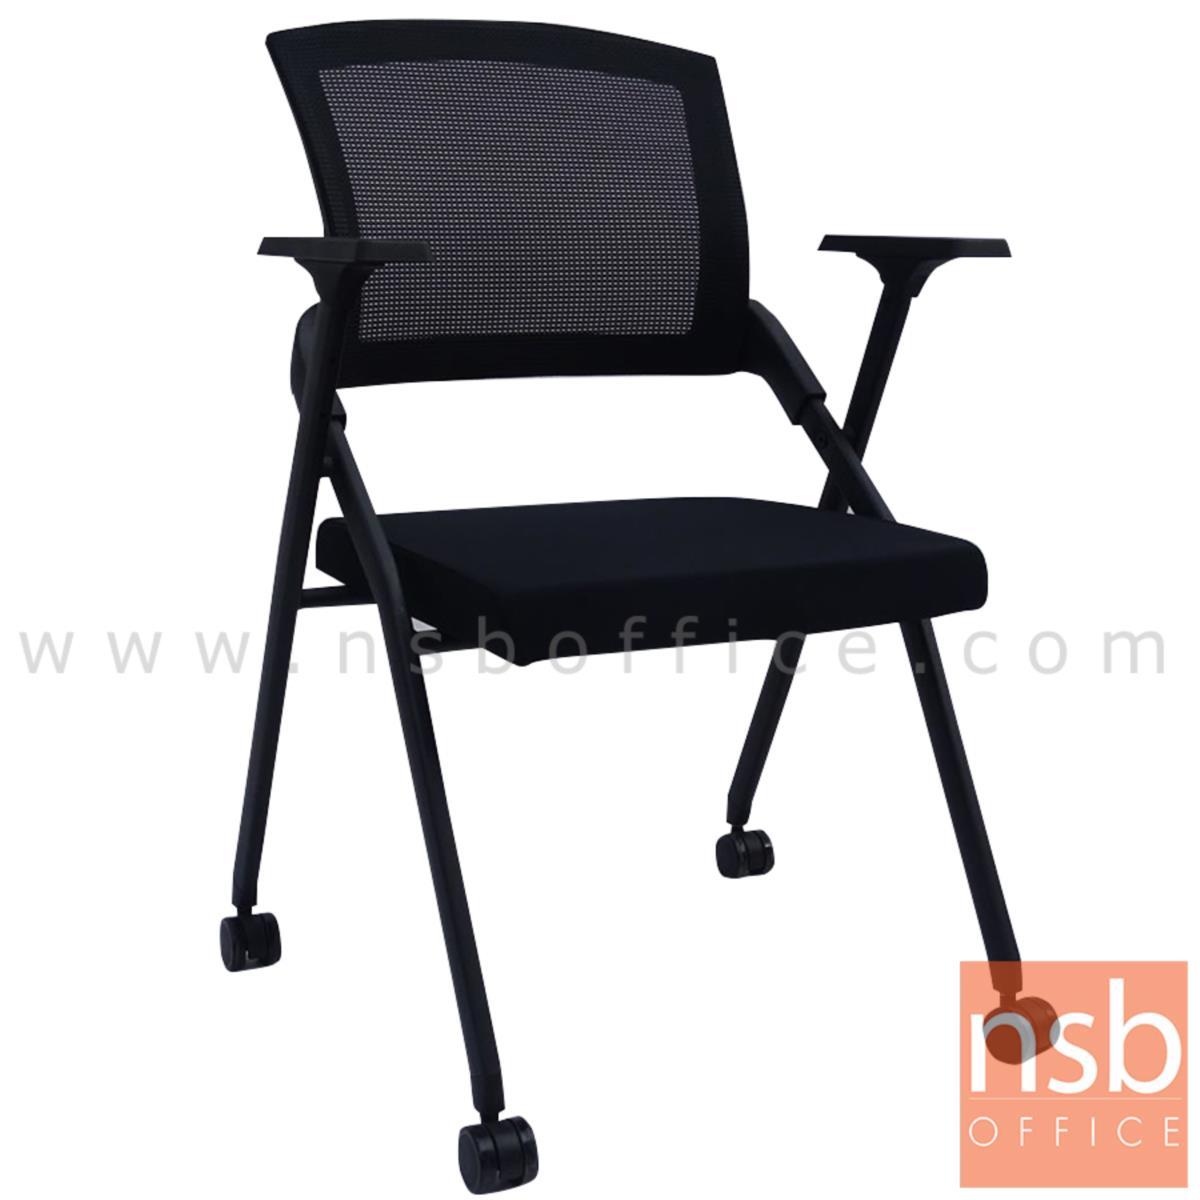 B24A283:เก้าอี้สำนักงานหลังเน็ต รุ่น Rolex (โรเล็กซ์)  ขาเหล็กพ่นดำ